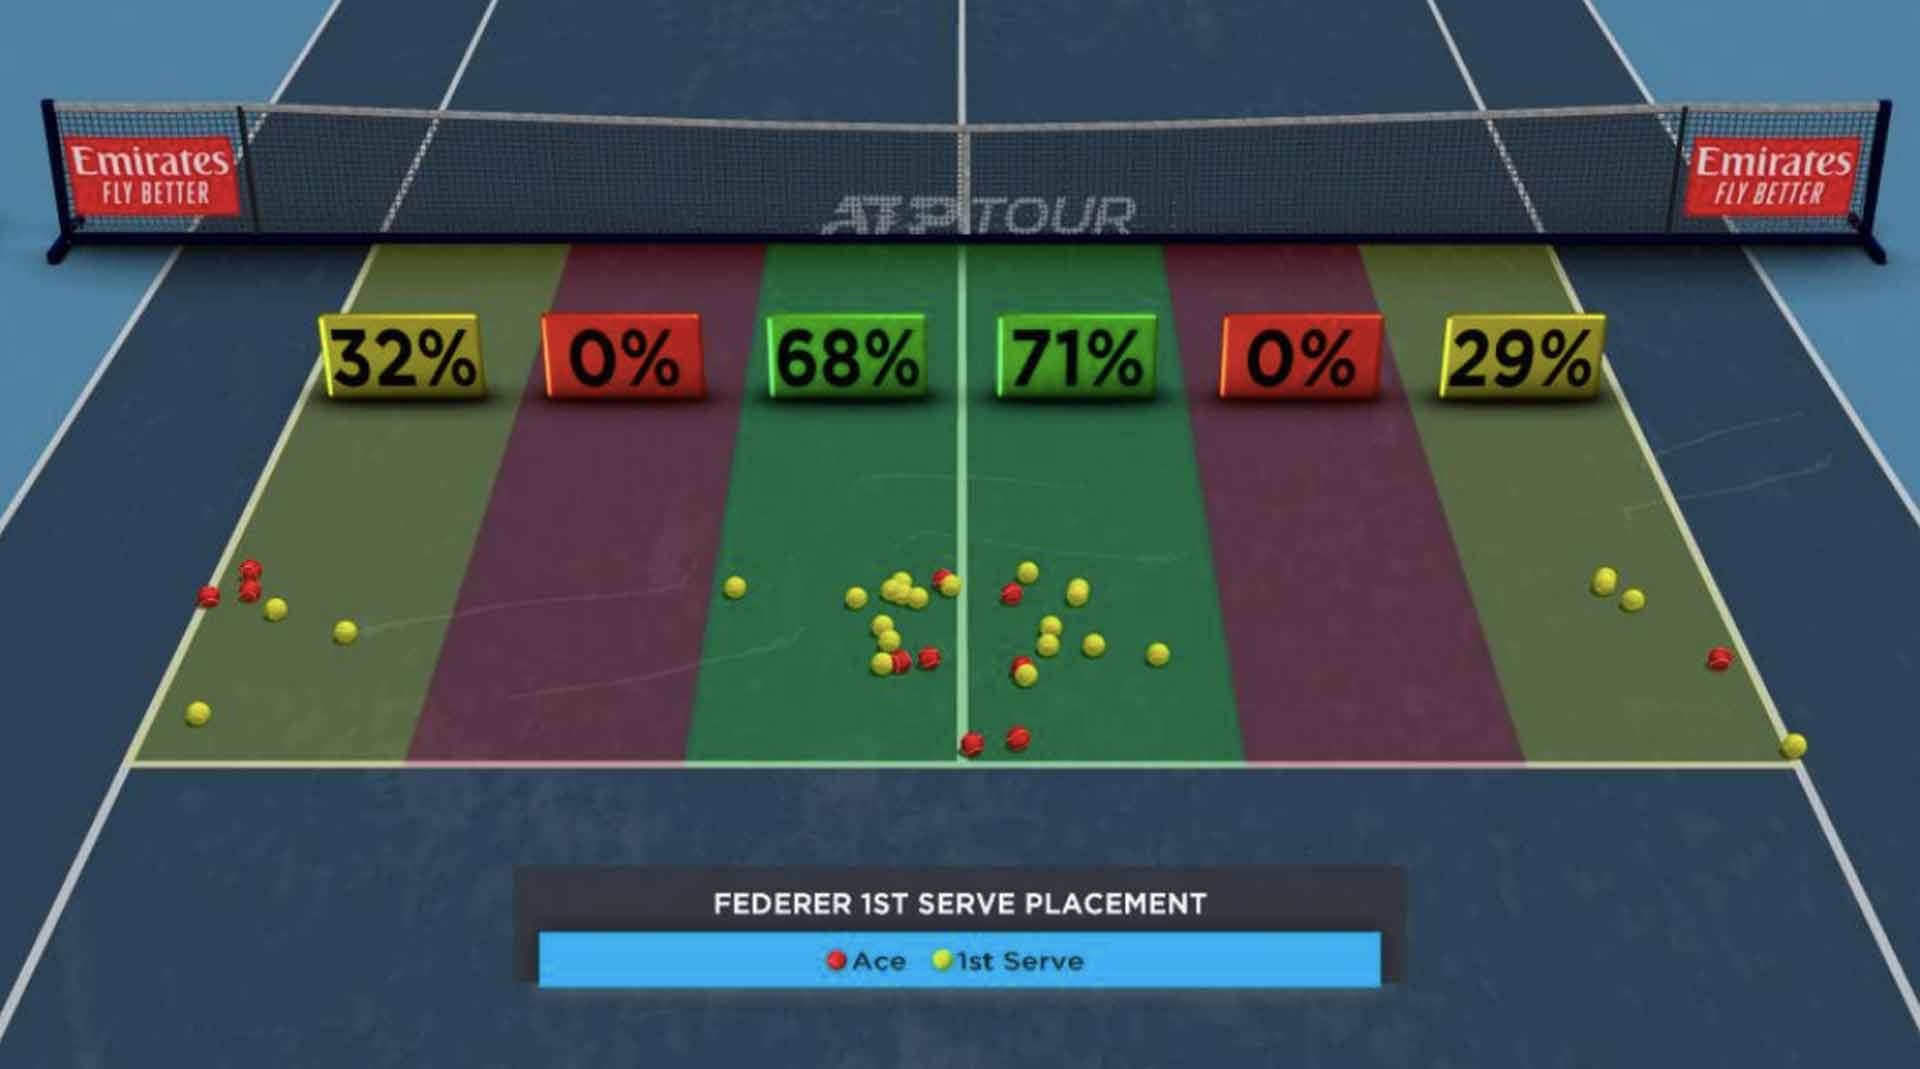 Federer First-Serve Placement